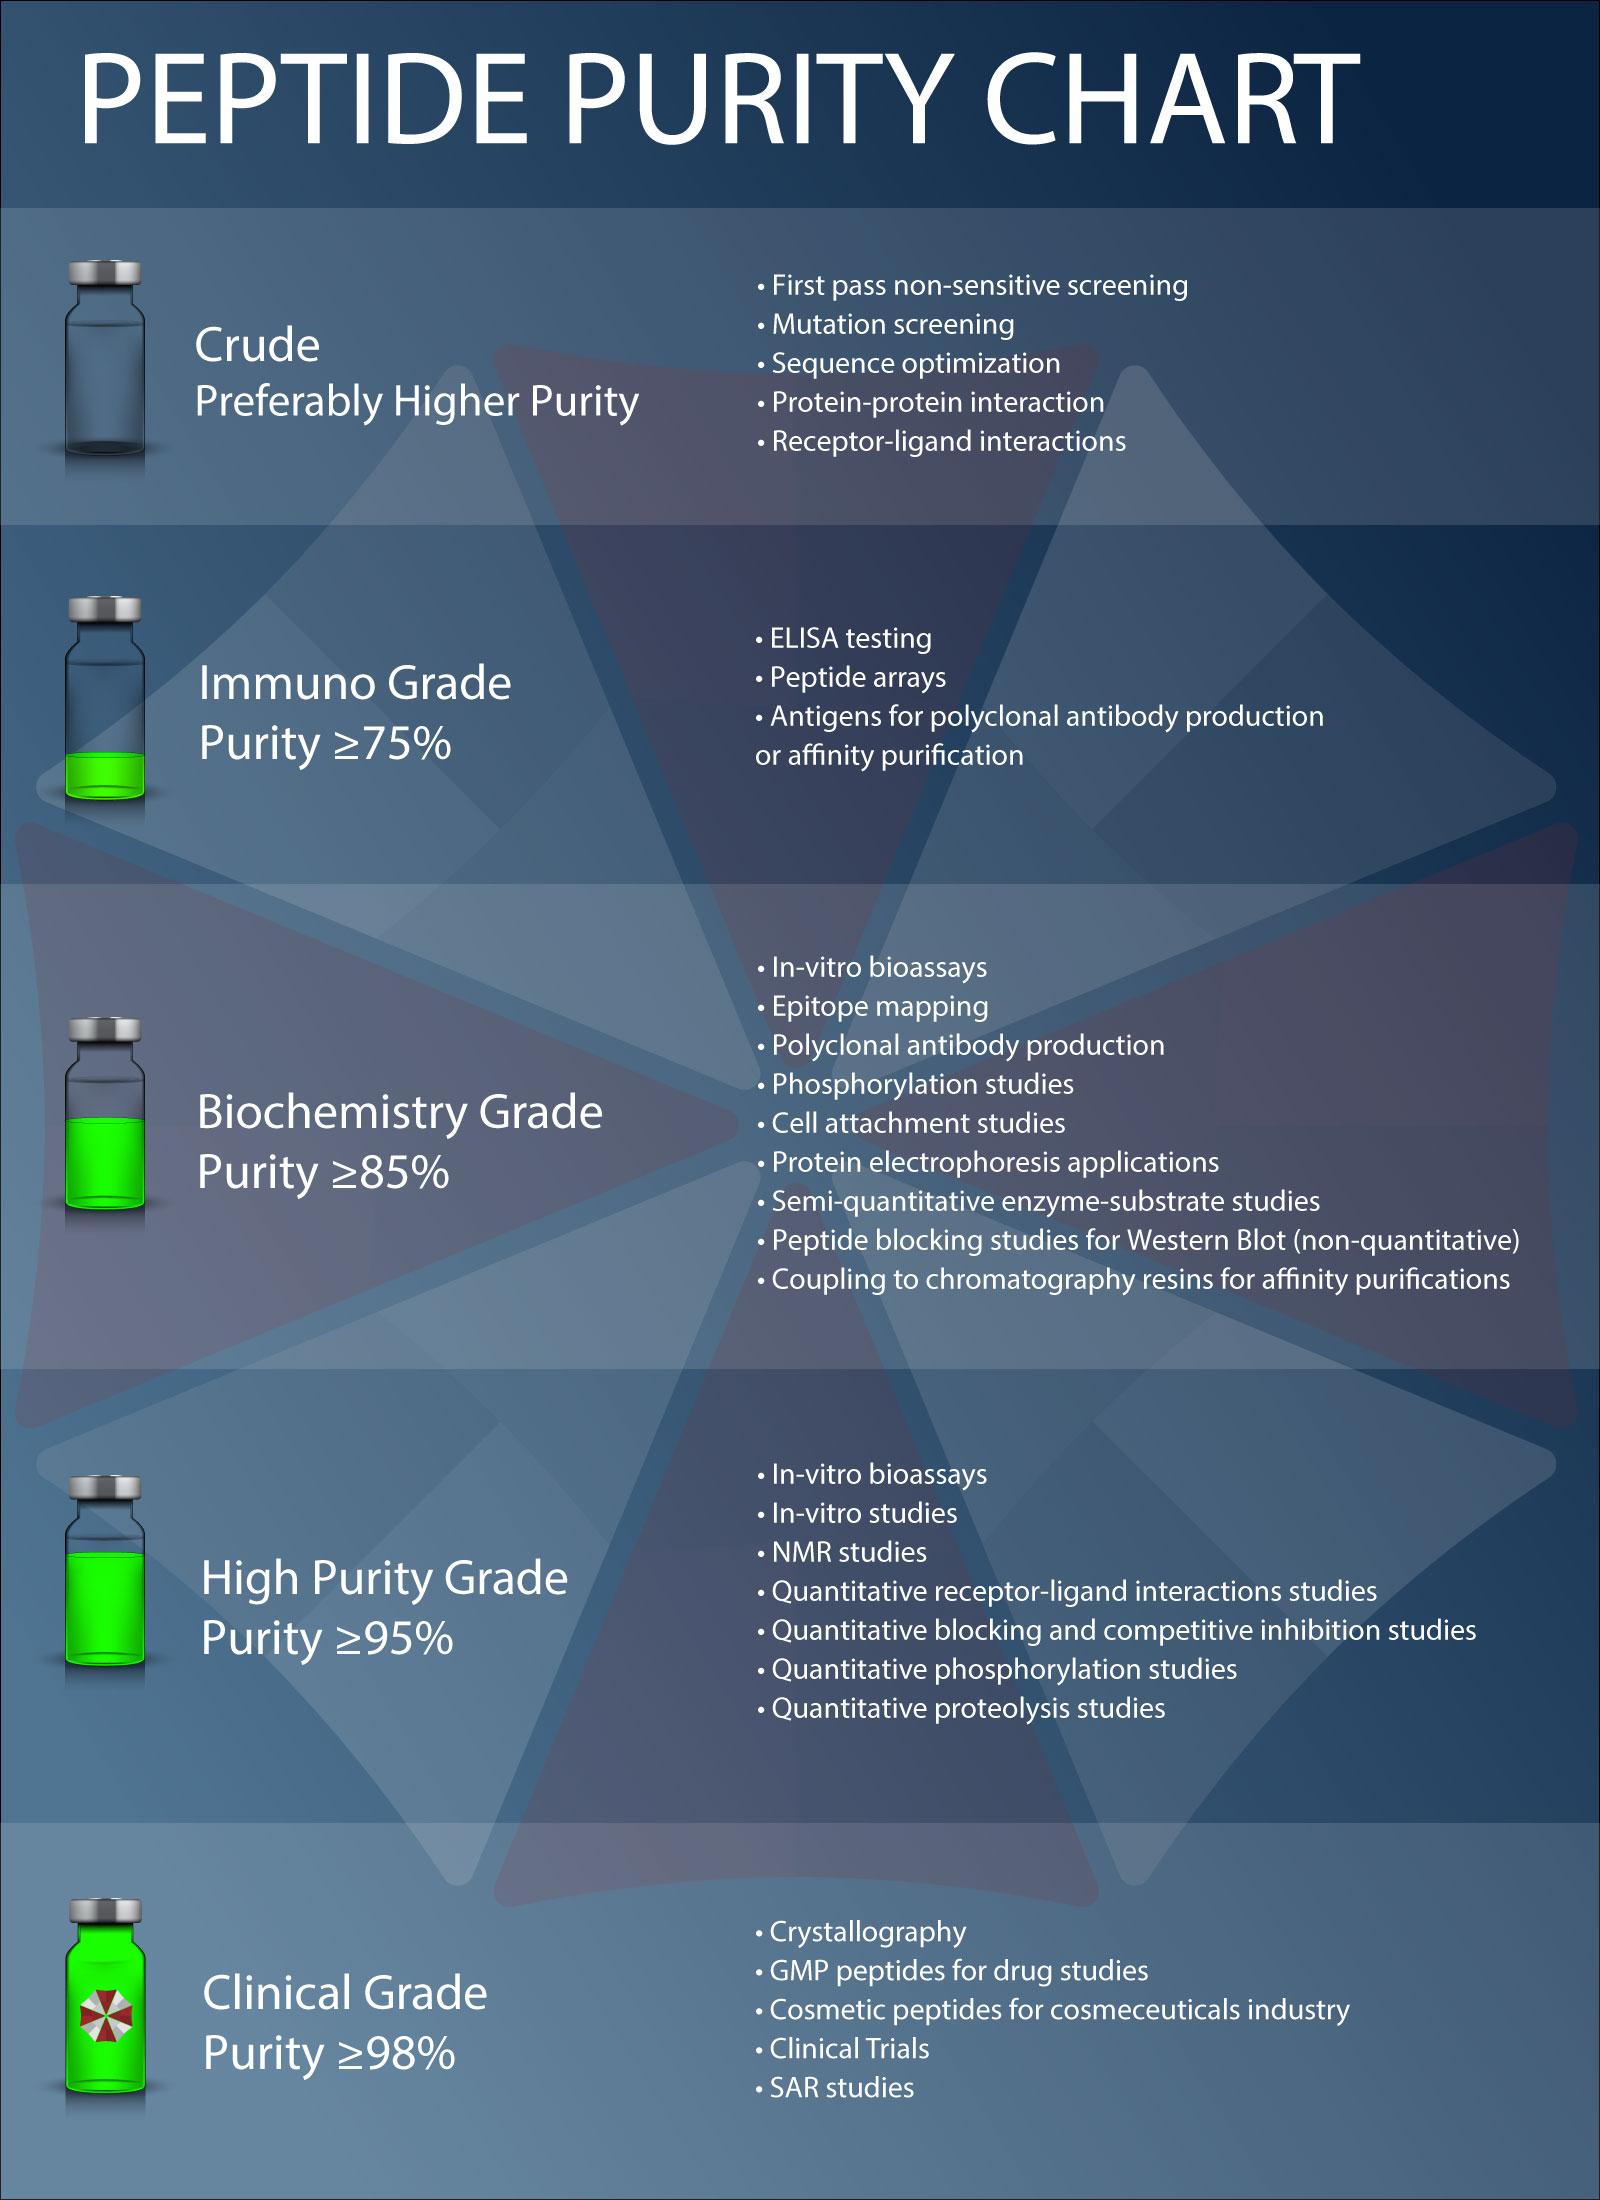 Peptide Purity Chart